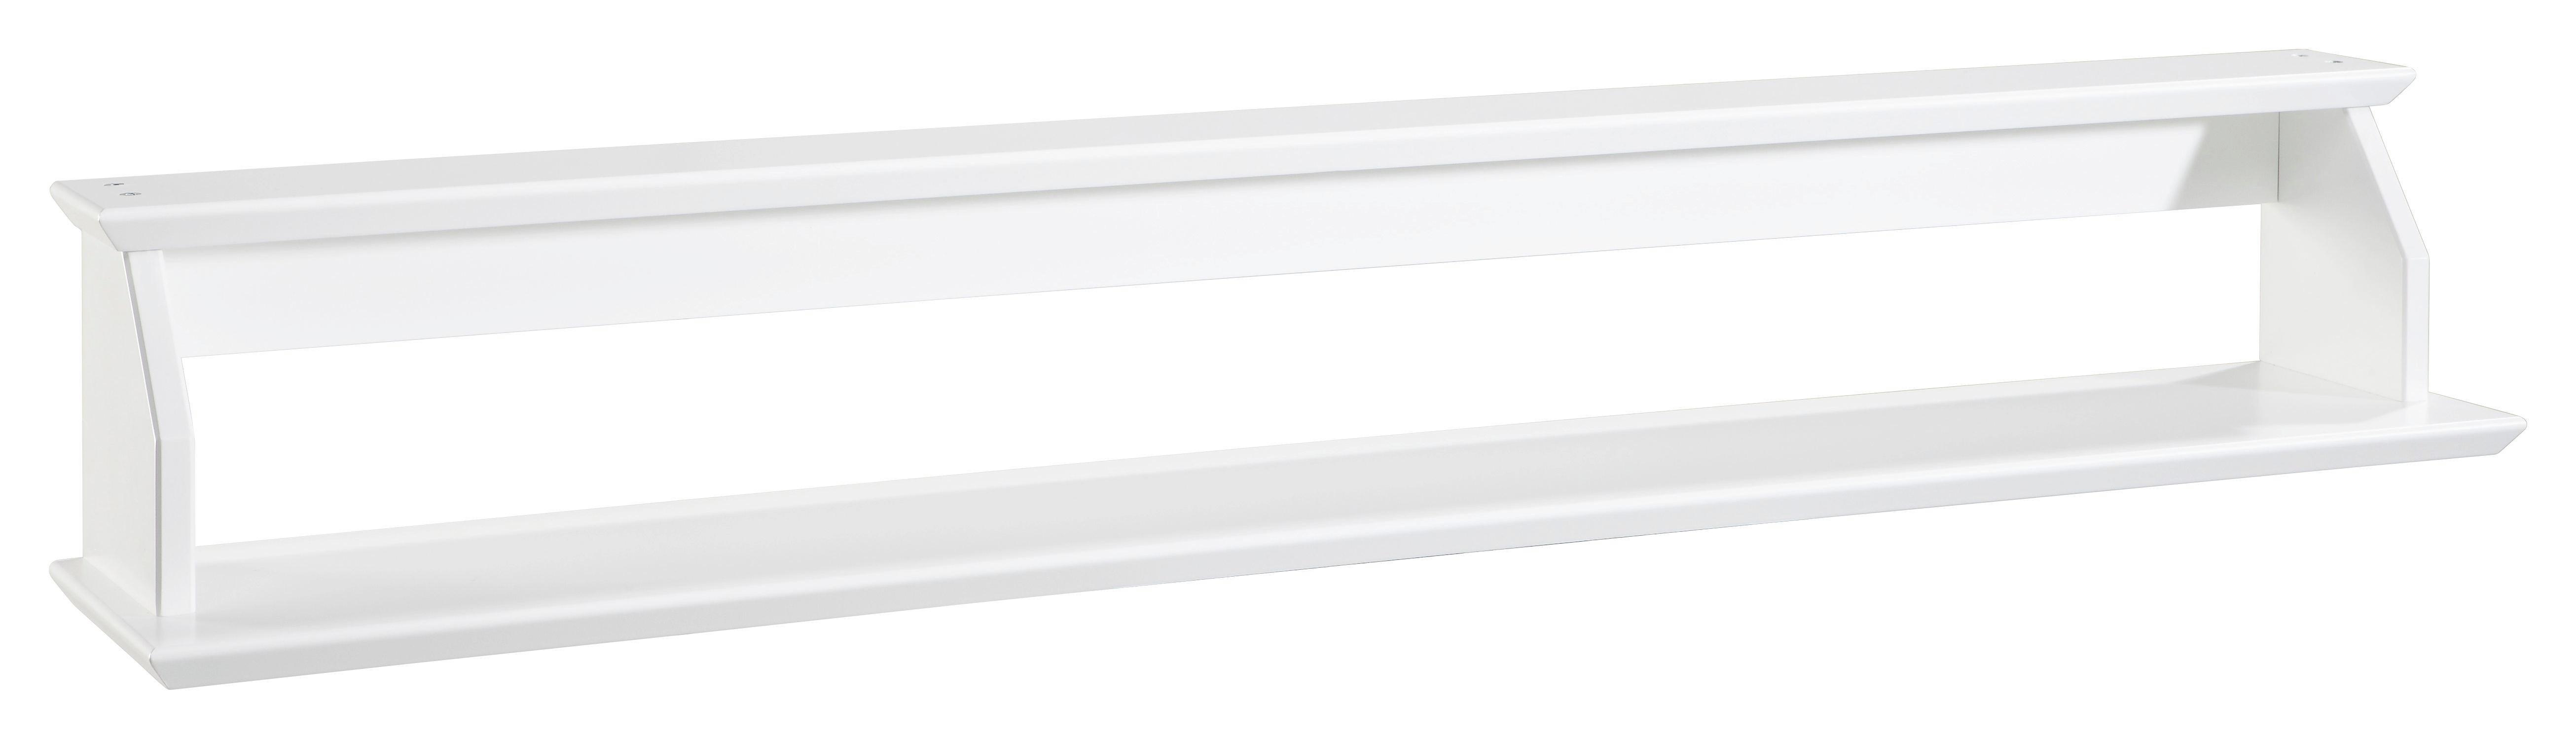 WANDREGAL Weiß - Weiß, Basics (93/20/18cm) - JIMMYLEE